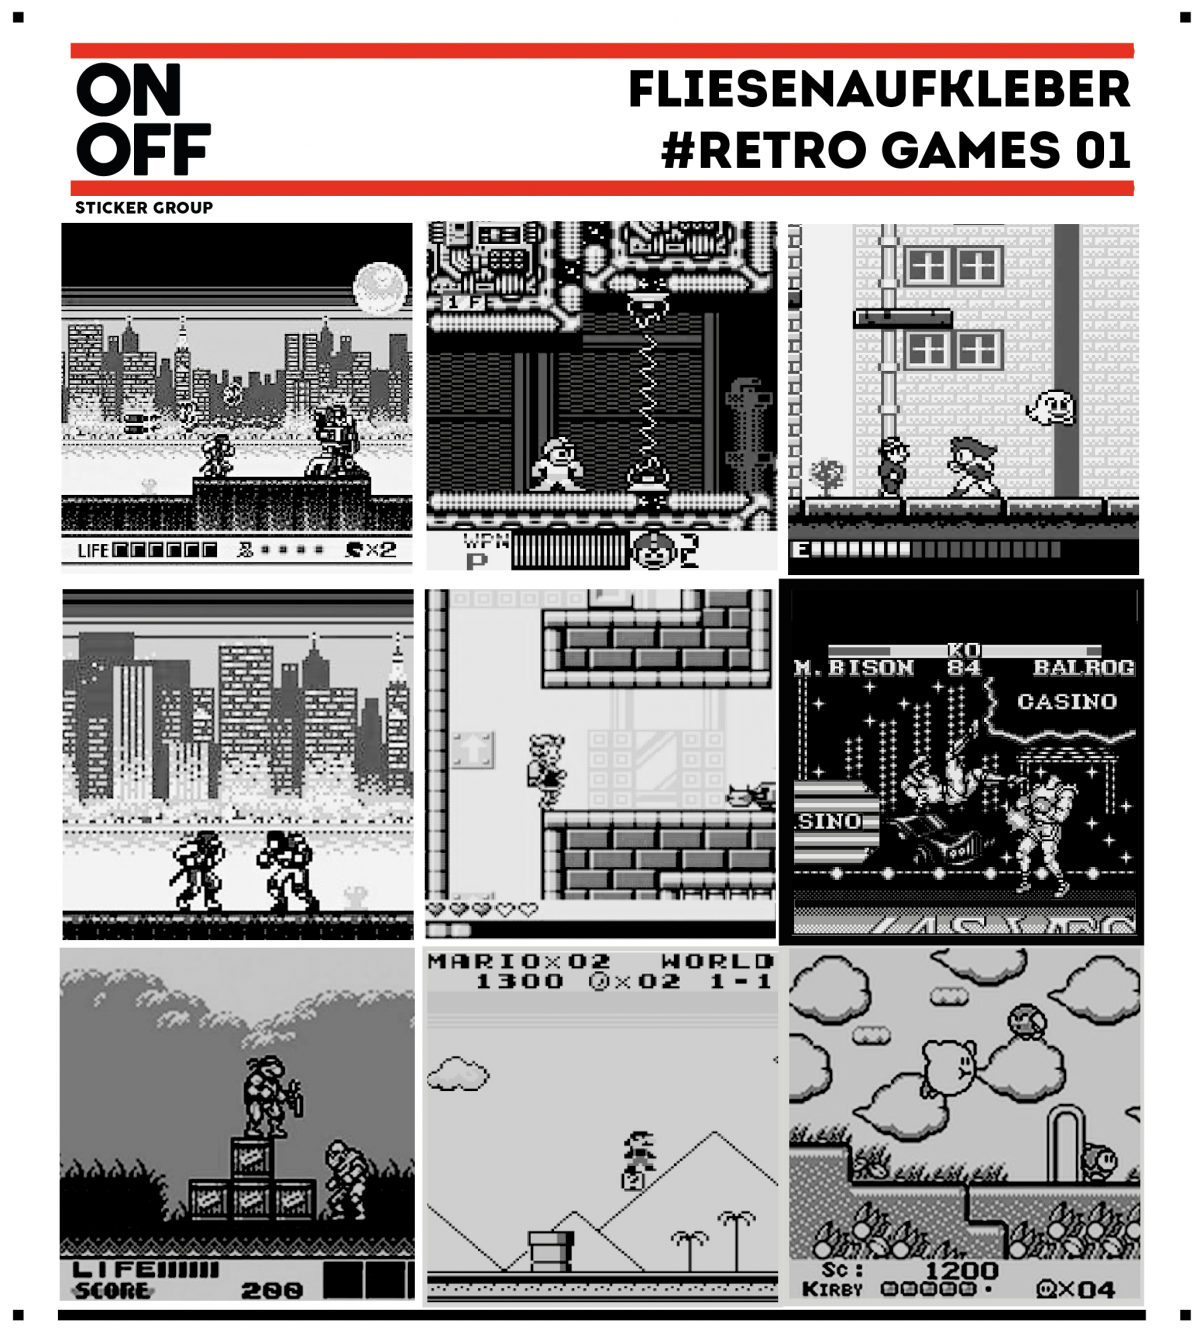 Fliesenaufkleber #retro games 01-10